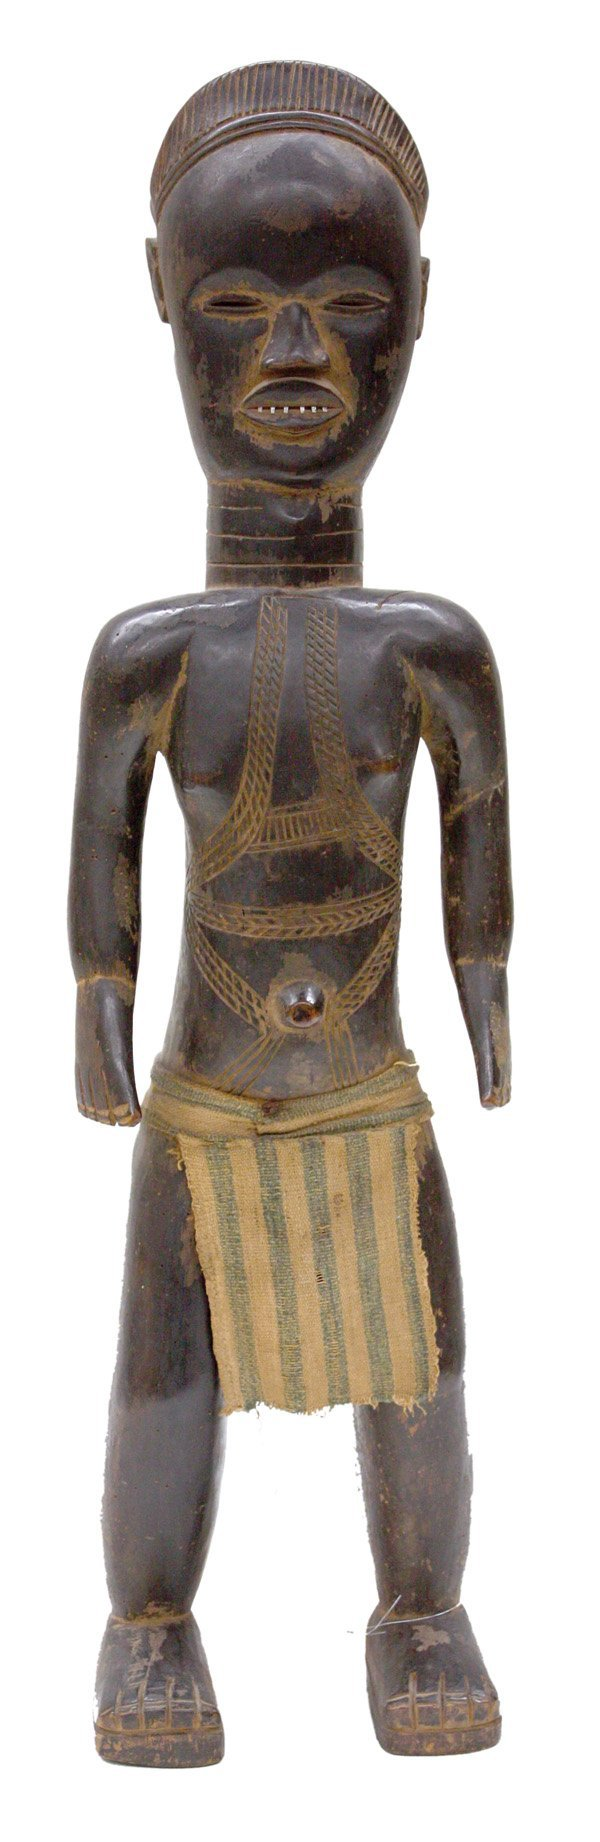 2268: Sra (Zlan)  Belewale Male Figure Dan Liberia